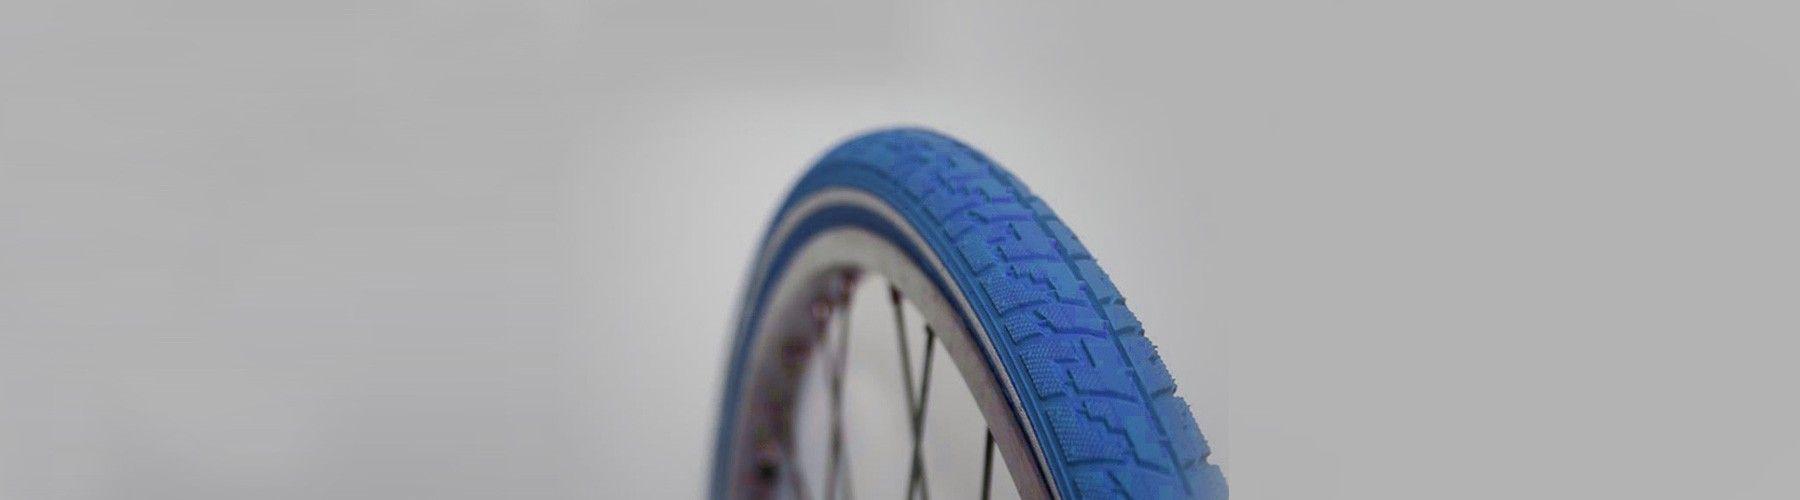 Bunte Fahrradreifen Fahrradreifen Fahrrad Reif